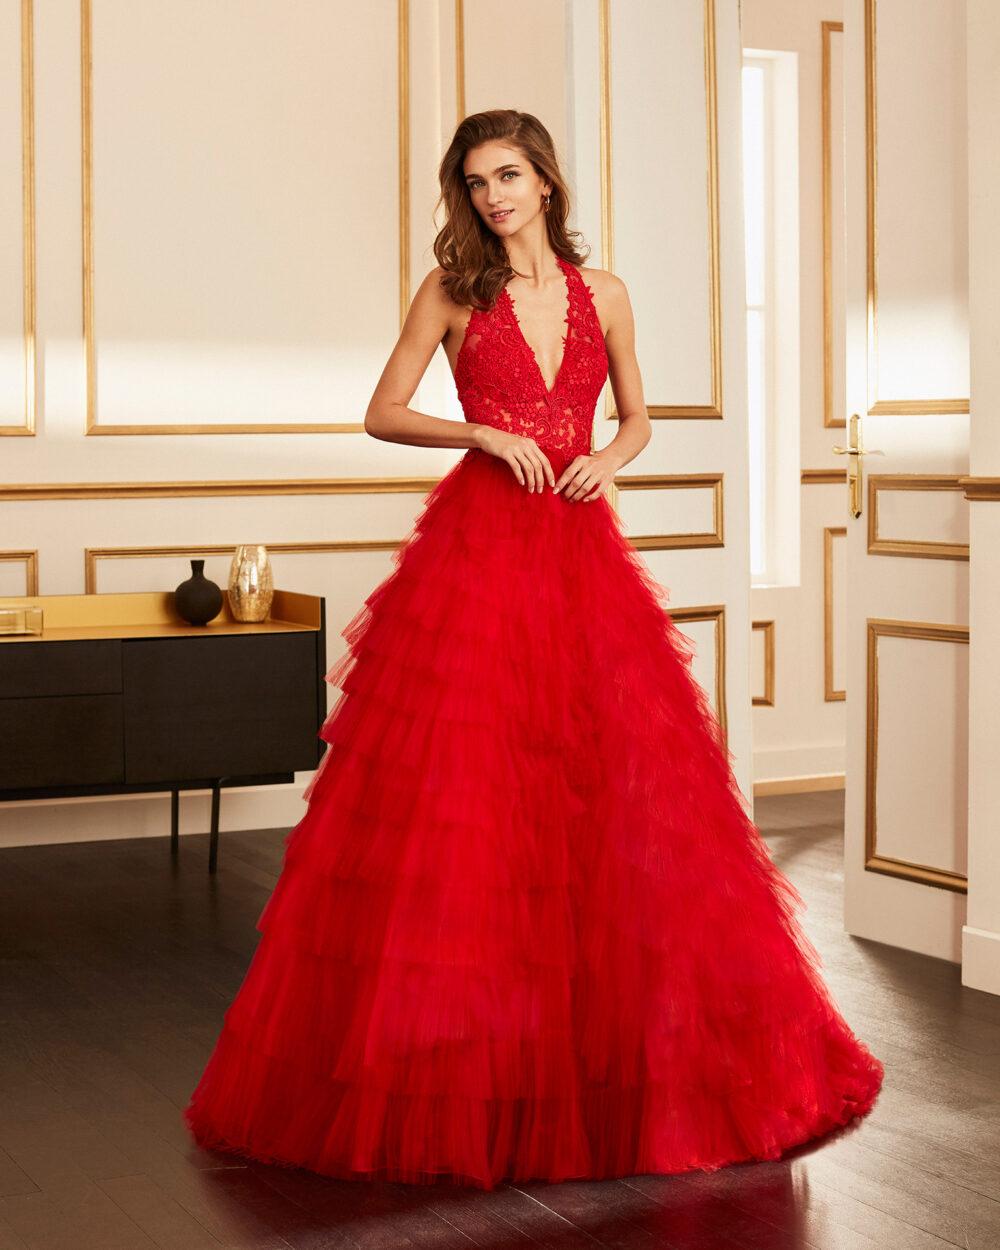 vestido de fiesta 2020 4J2F4 MARFIL BARCELONA 2